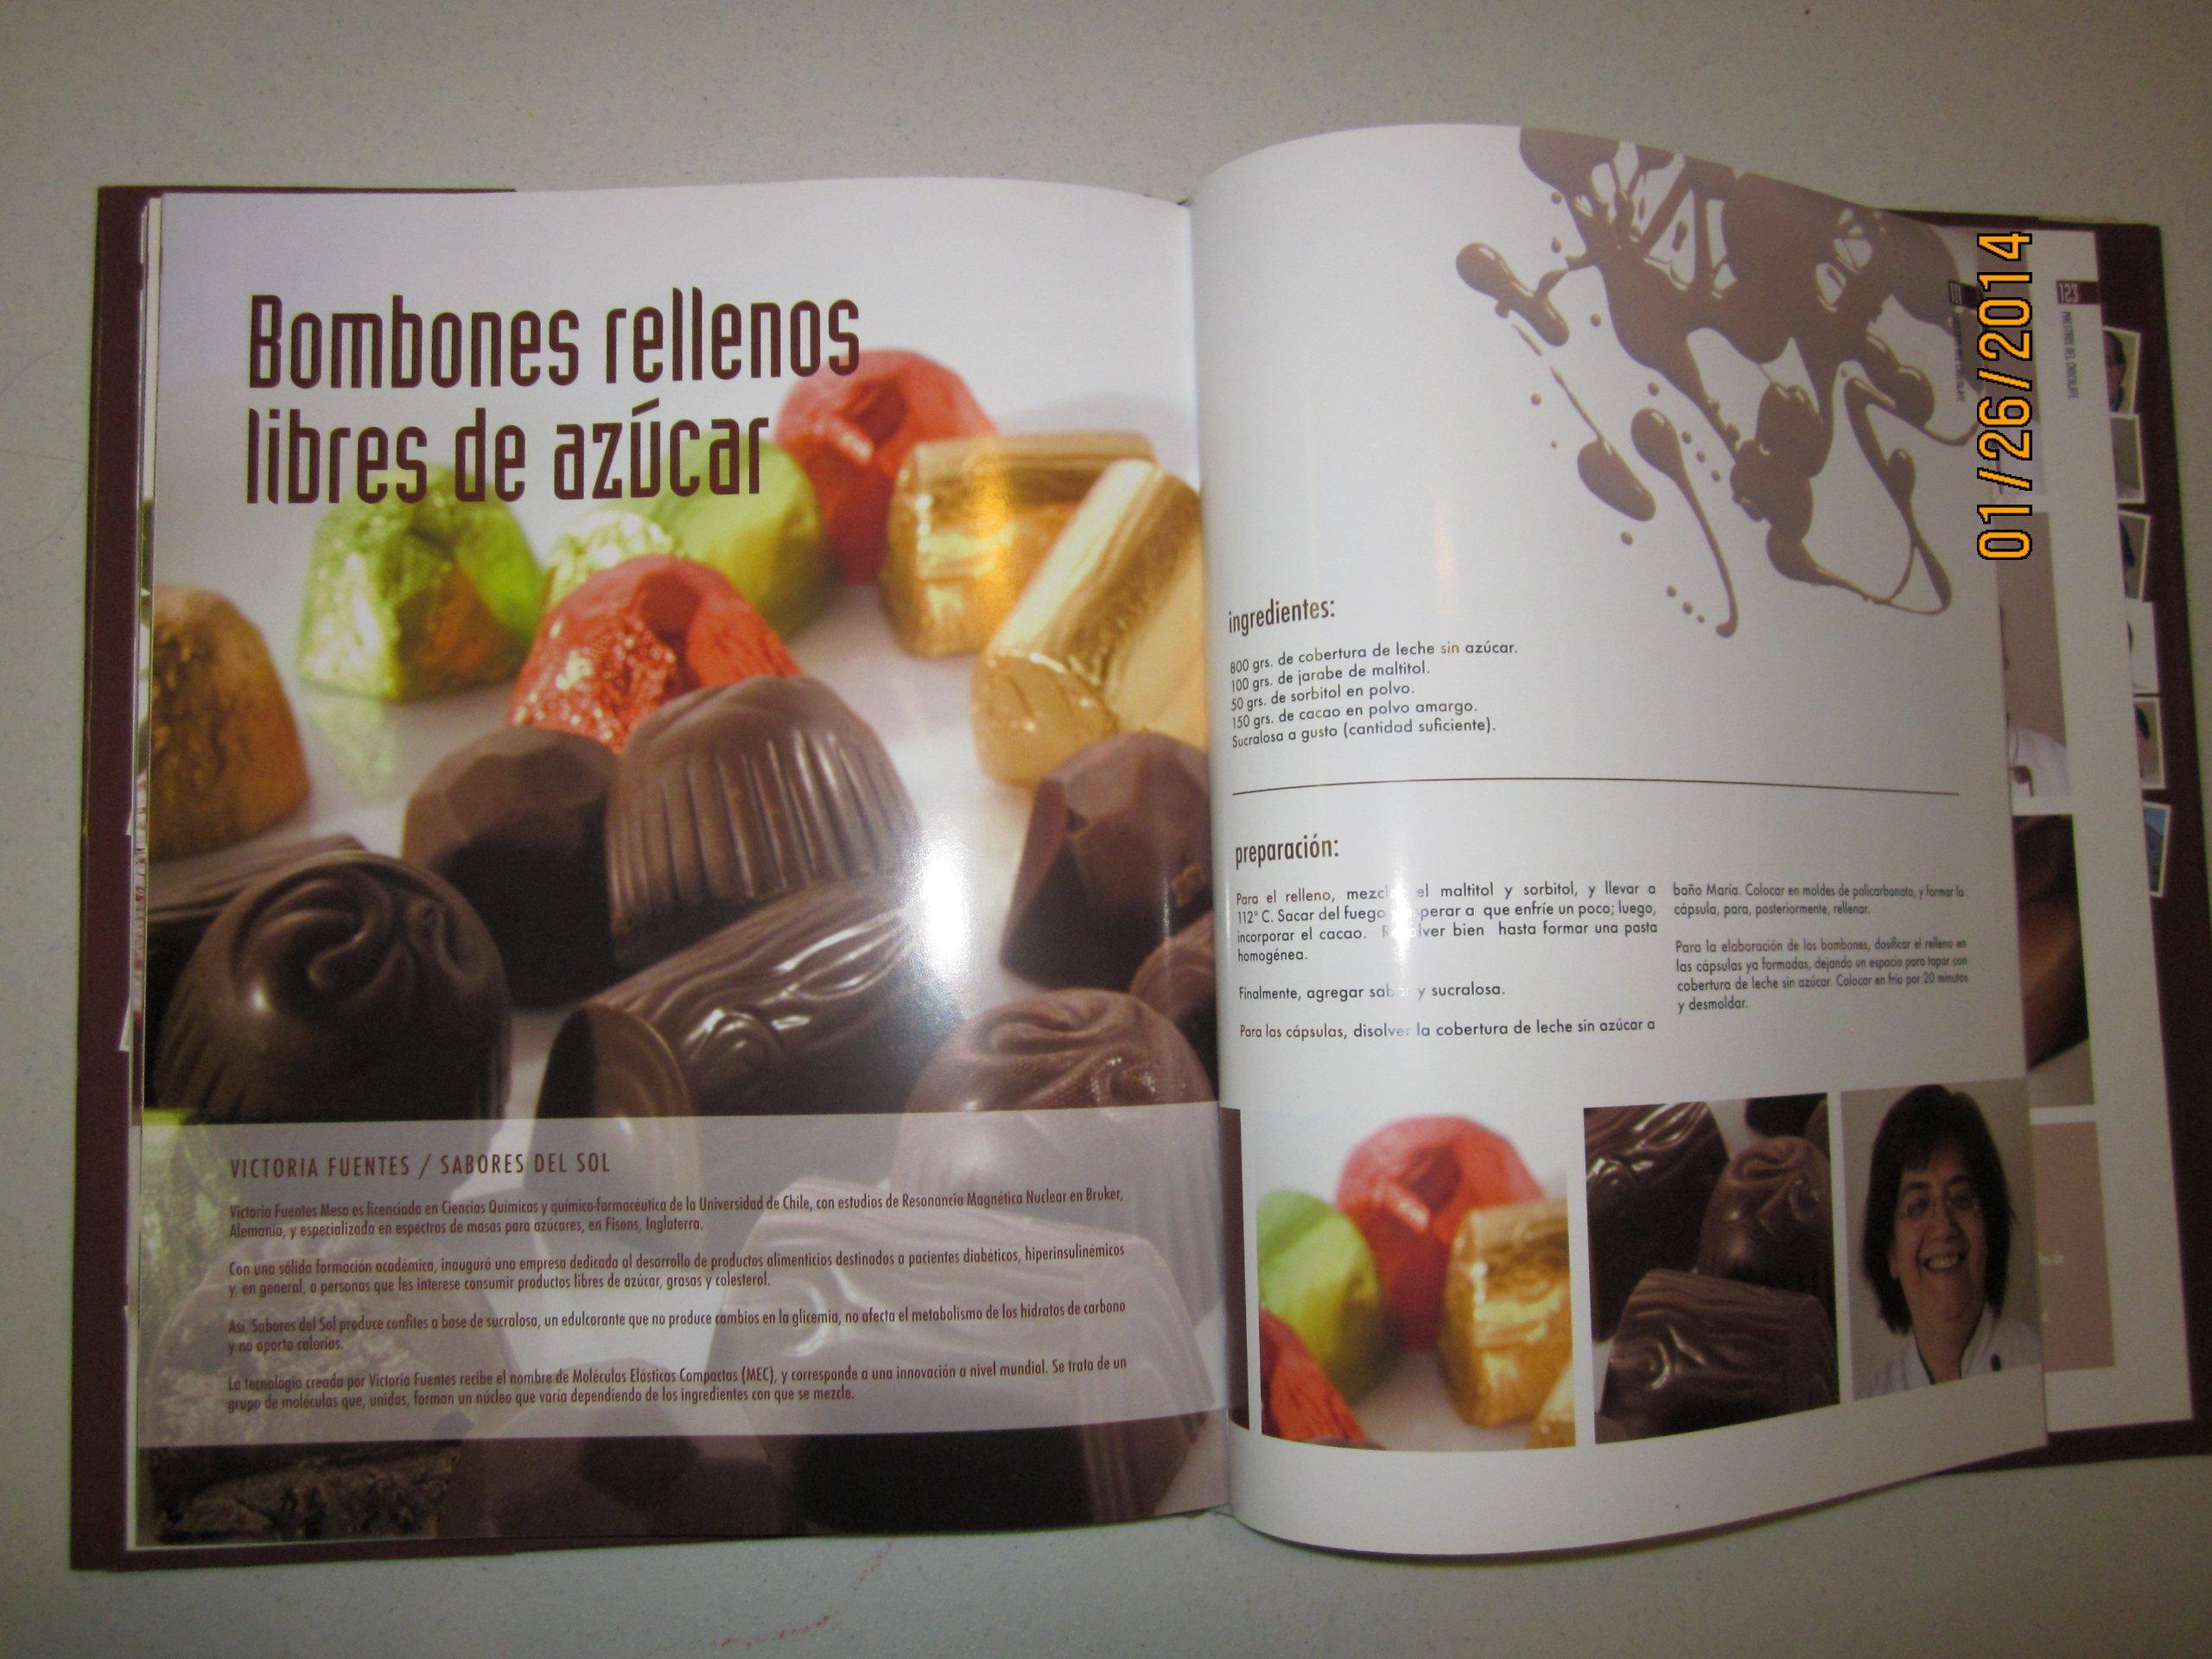 Maestros Del Chocolate - Chile (Maestros del Chocolate una Publicacion de Altara-Mireaux LTDA.): Gonzalo Berdugo, Empresas Carozzi -Chile, Ximena Ramos, ...